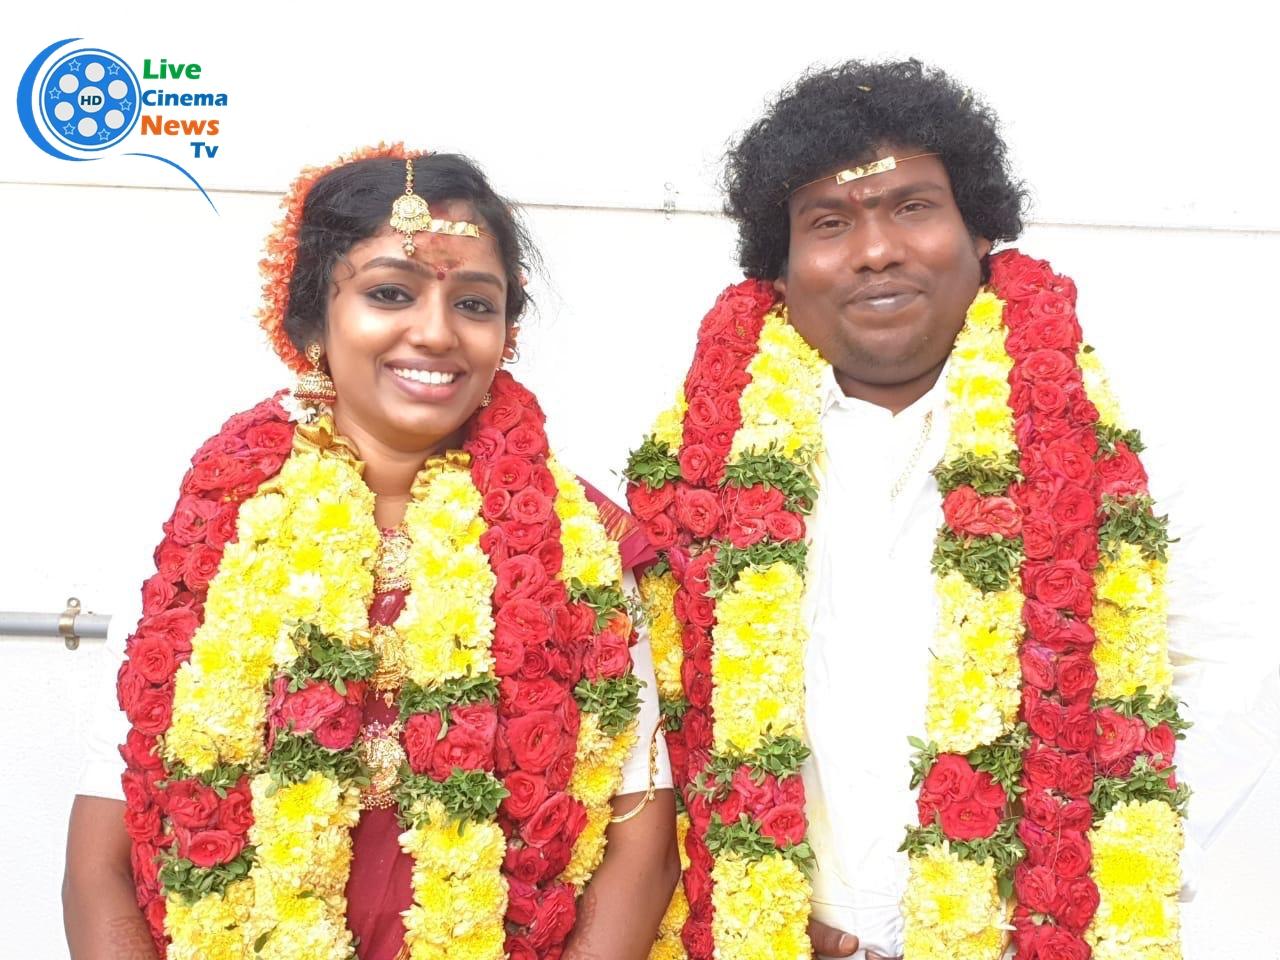 Yogibabu at the wedding